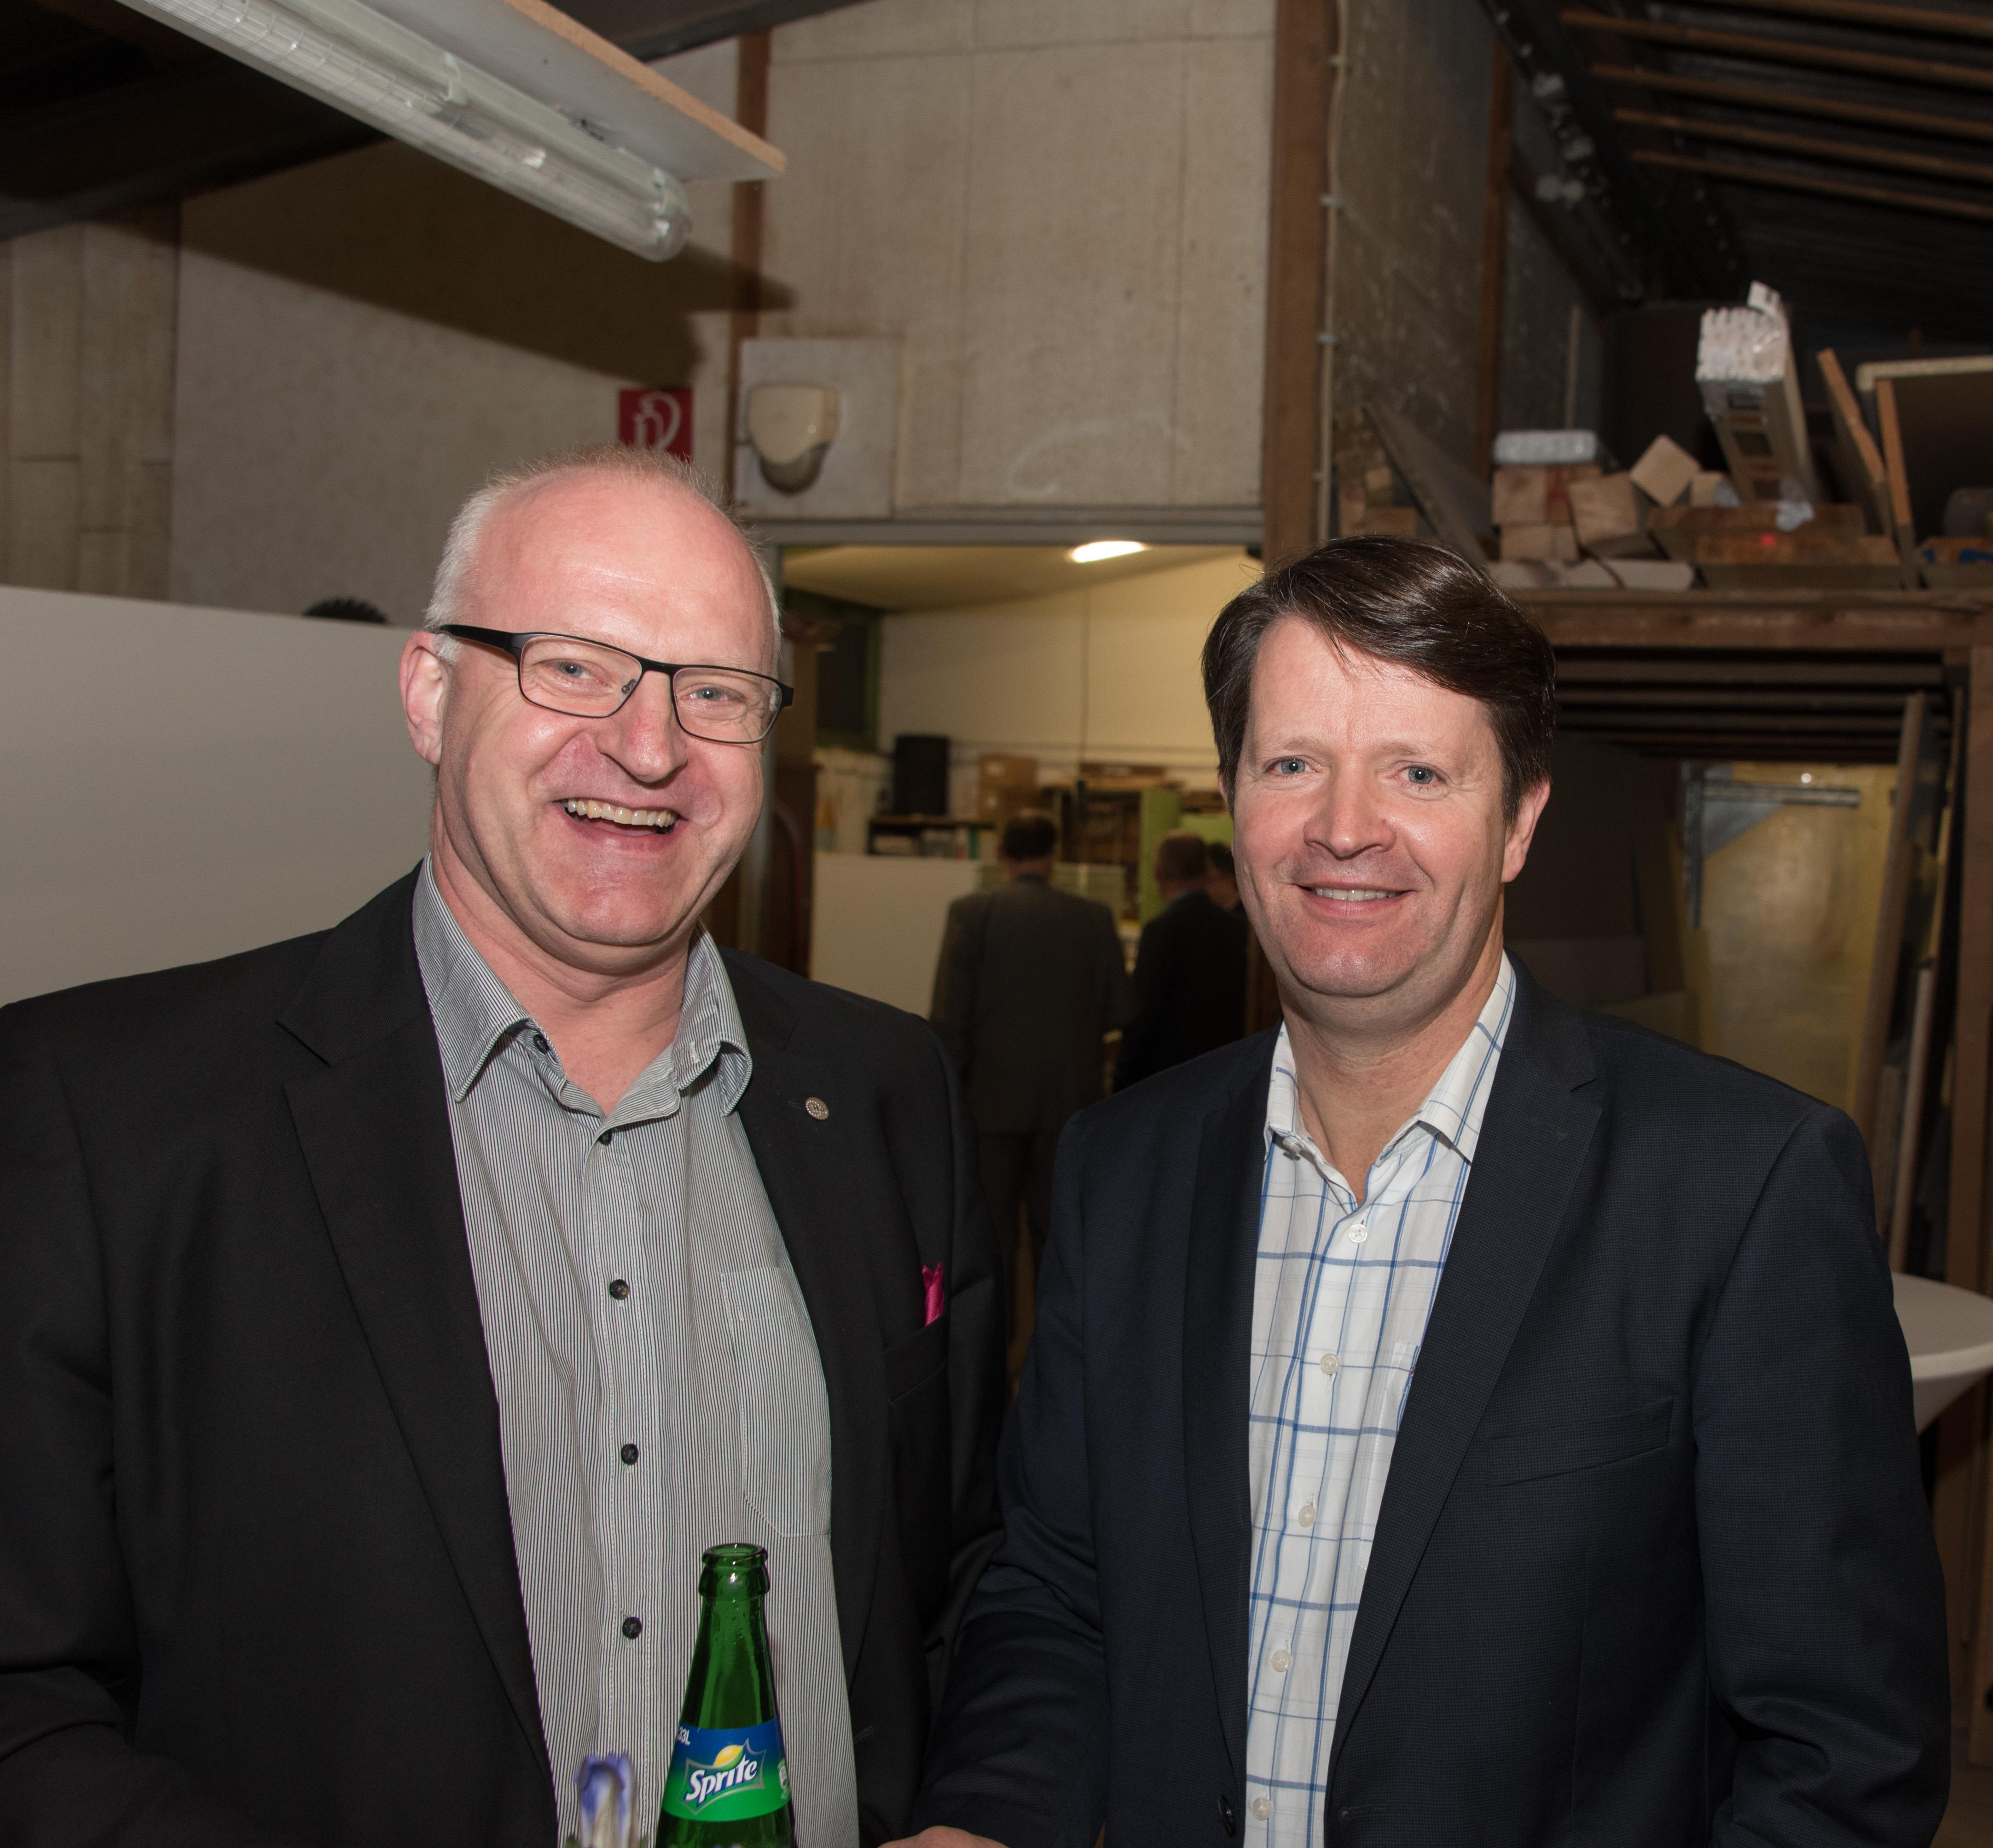 vl Hubert Greinert, Carsten Niemann